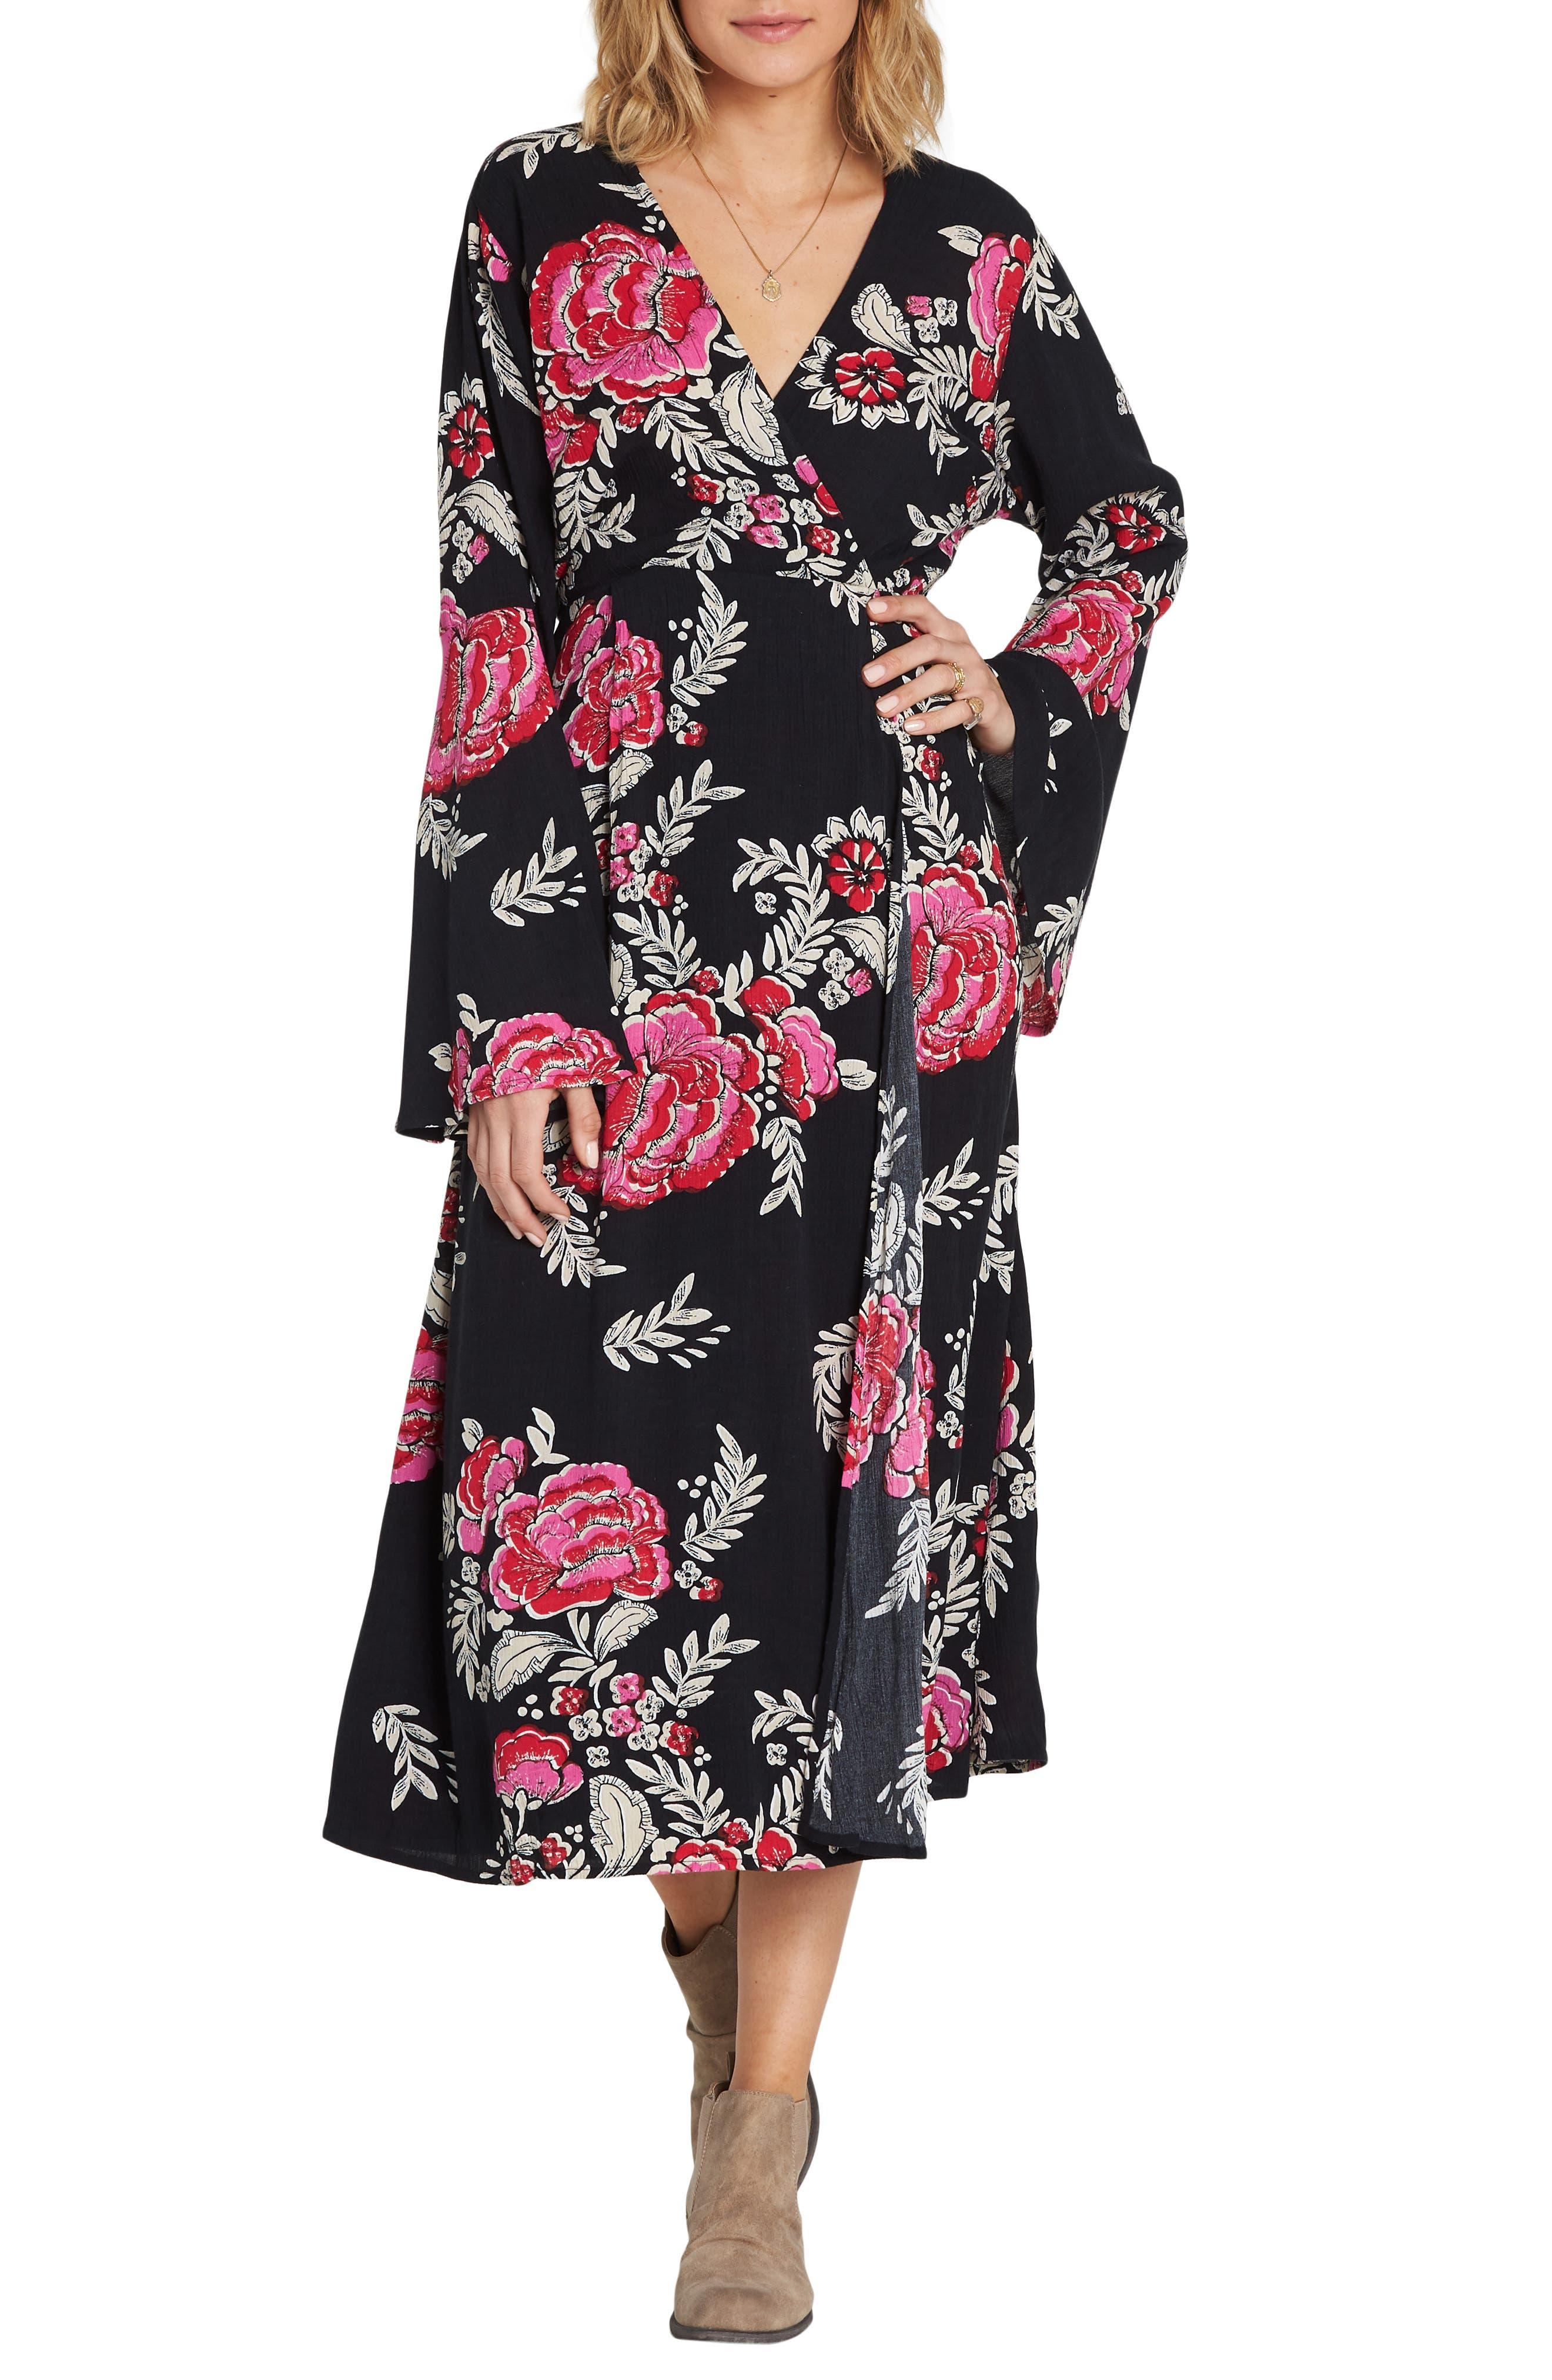 Floral Whispers Floral Midi Dress,                             Main thumbnail 1, color,                             BLACK